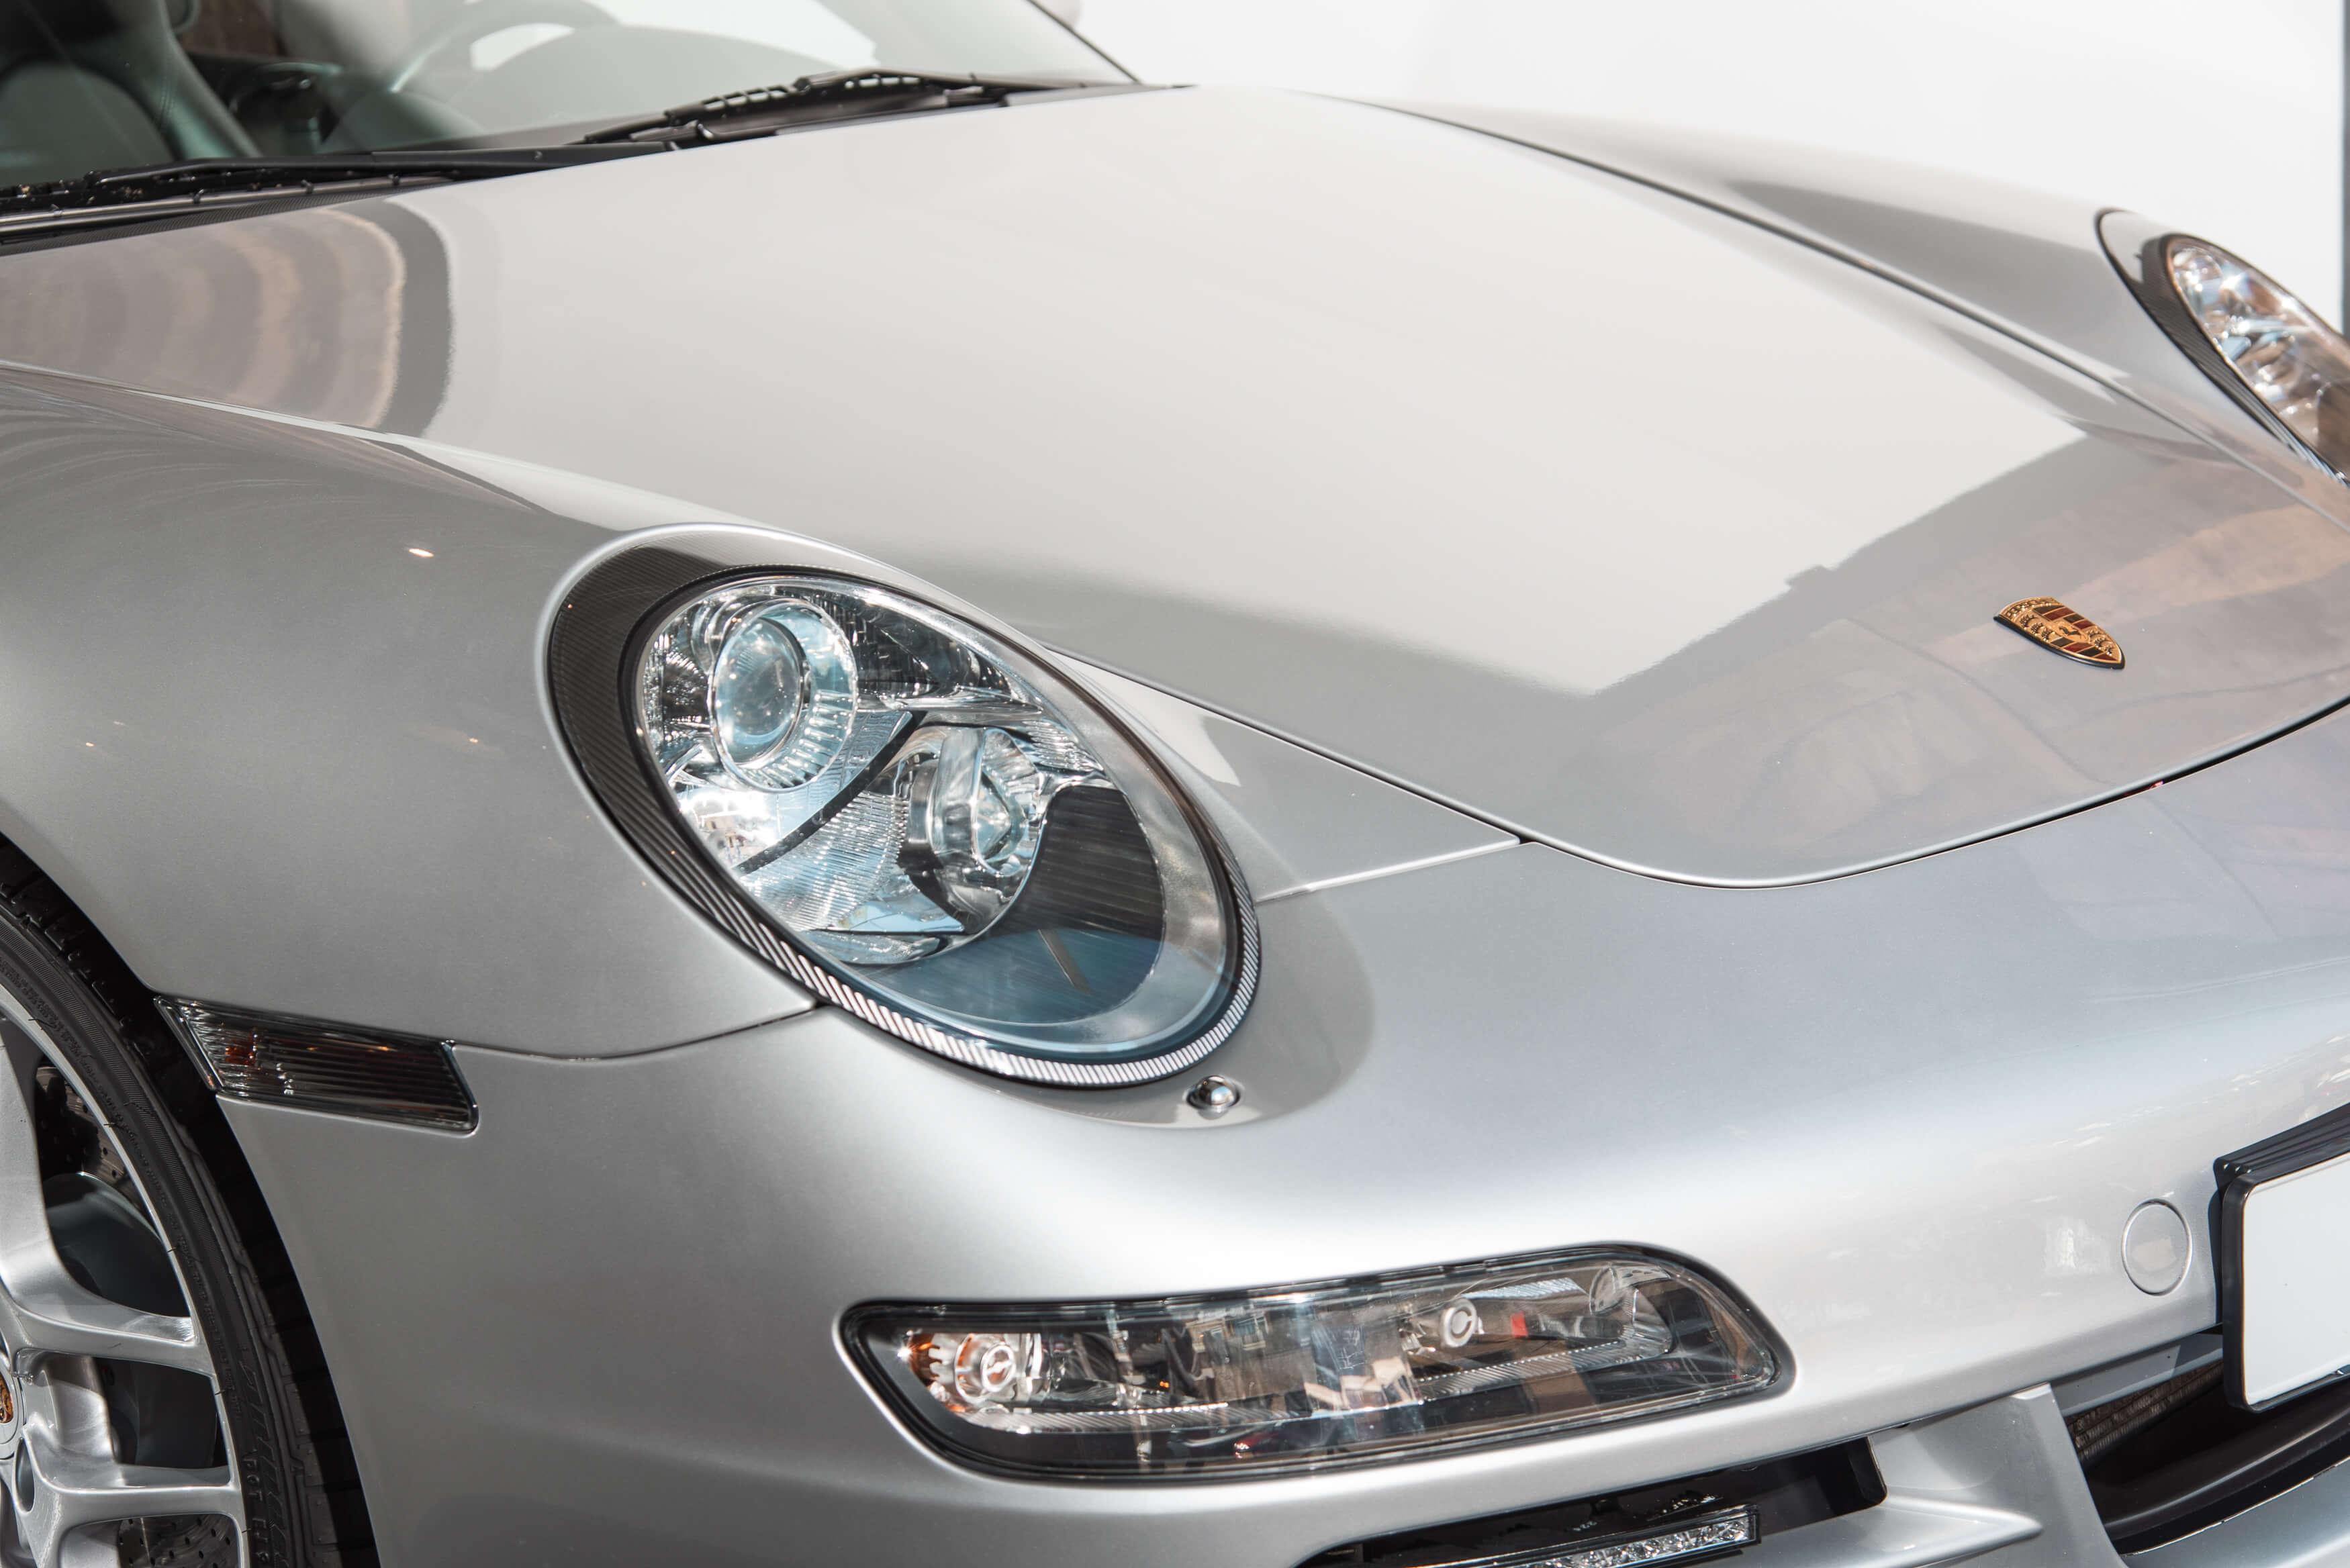 Porsche 997 Carrera 2 automaat Car Service Visser gespecialiseerd in Porsche - 9